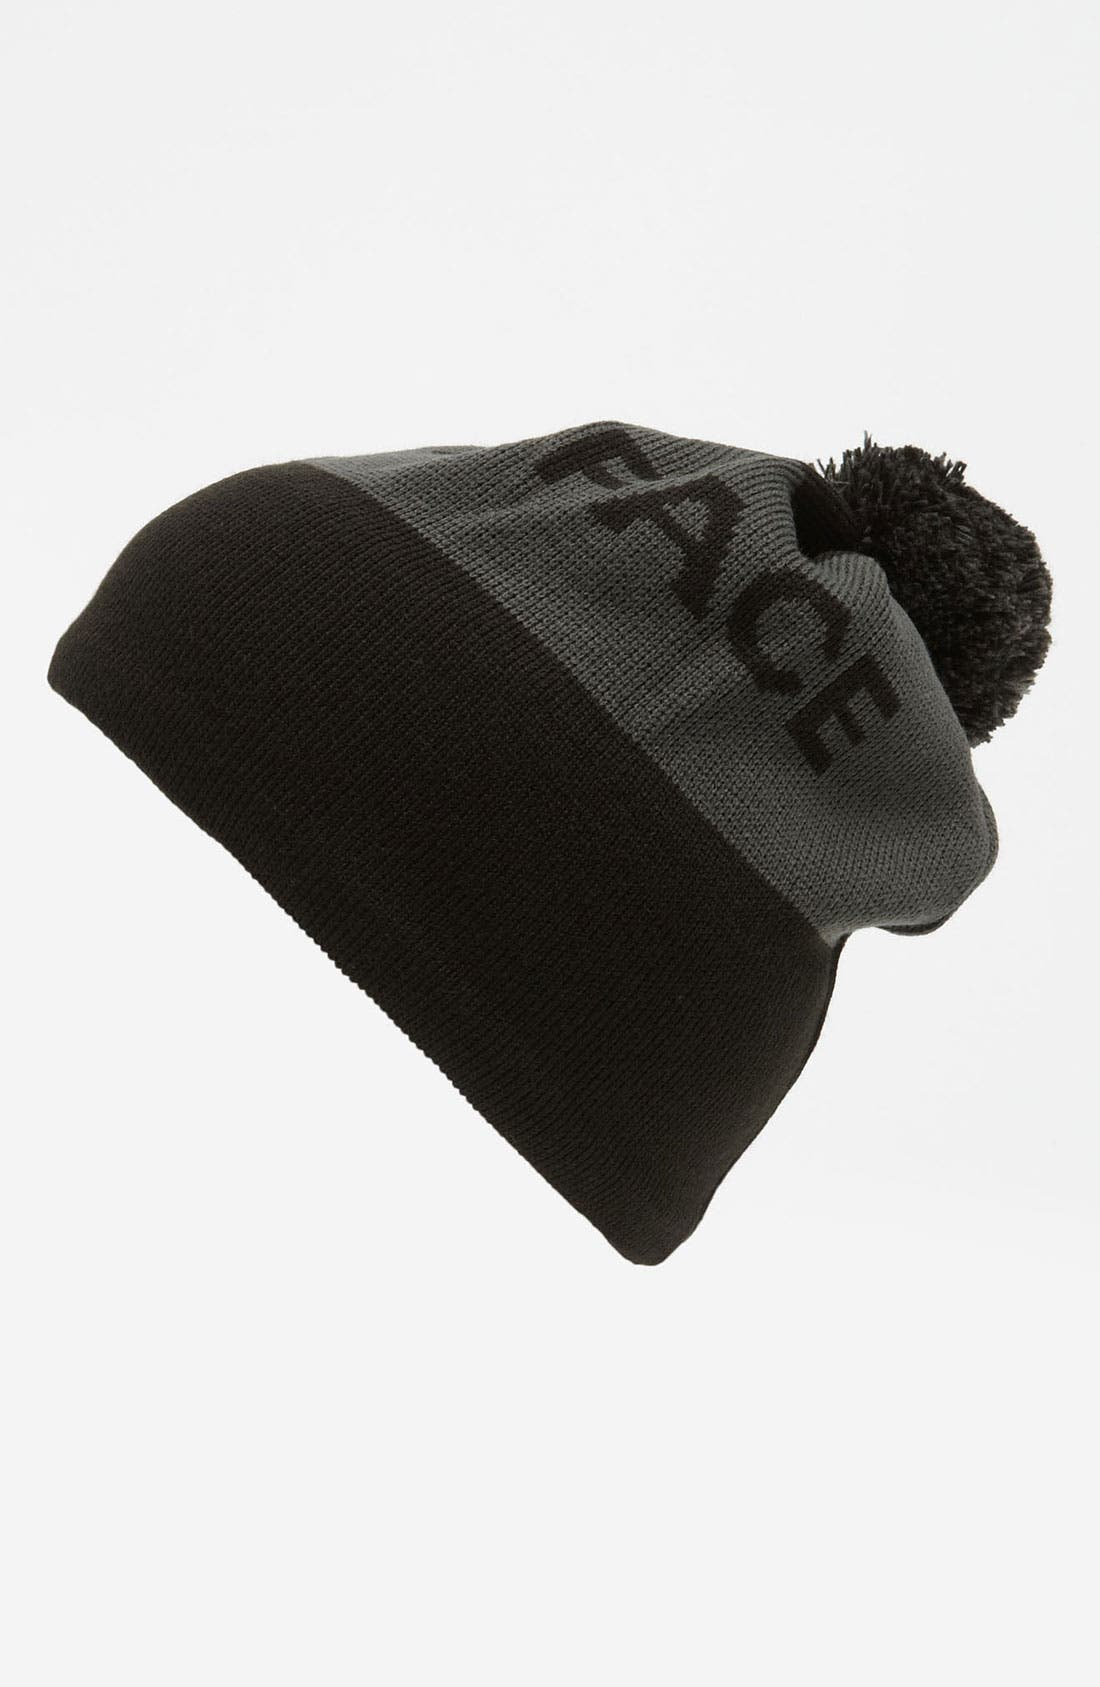 Main Image - The North Face 'Throwback' Knit Cap